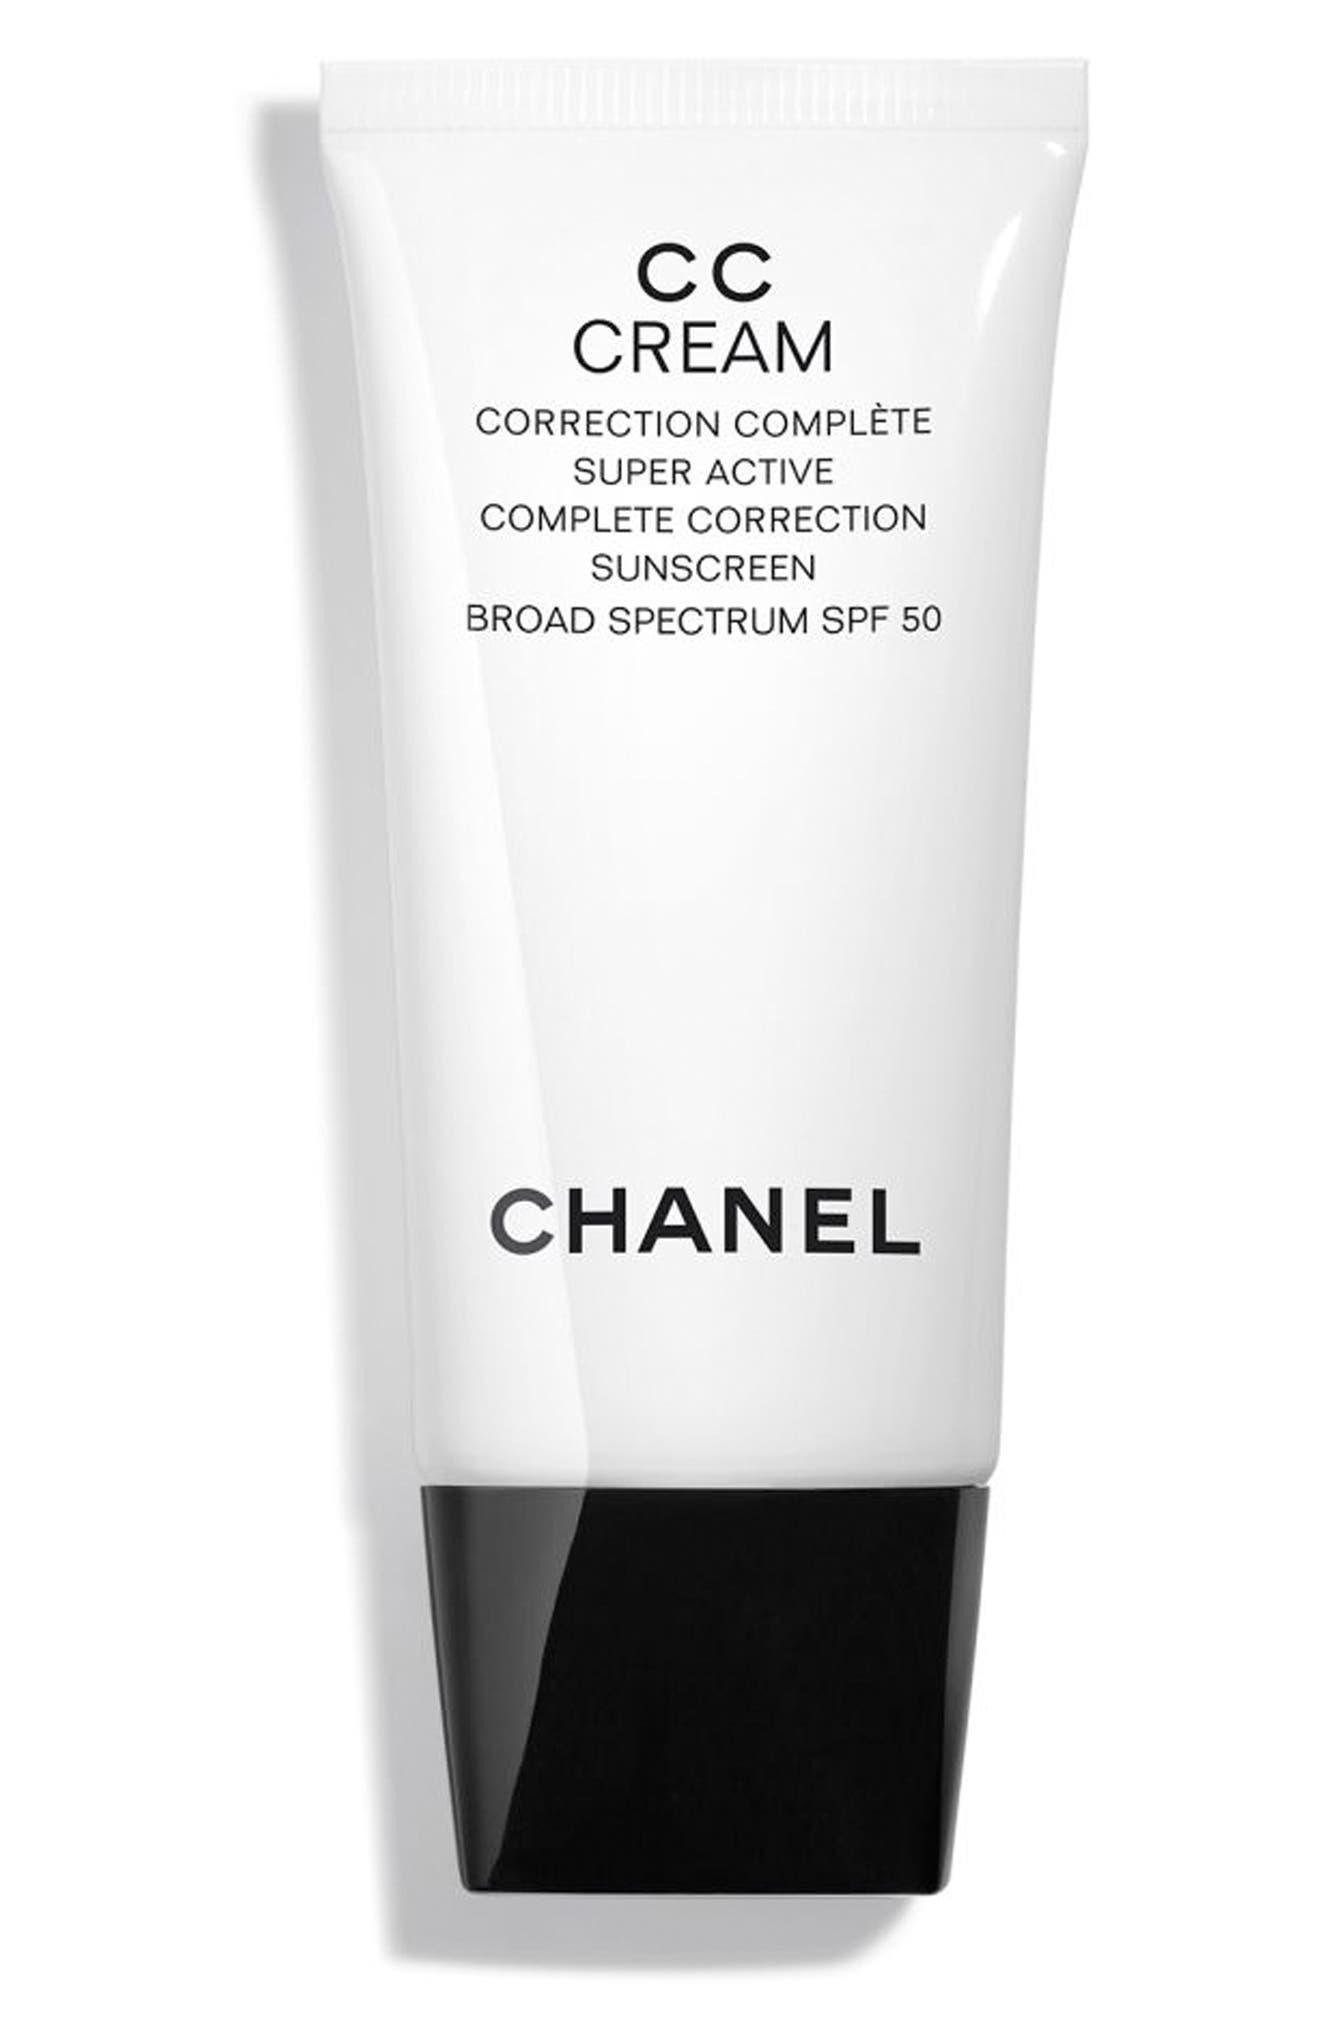 CHANEL CC CREAM Super Active Correction Complete Sunscreen SPF 50, Main, color, BEIGE 10